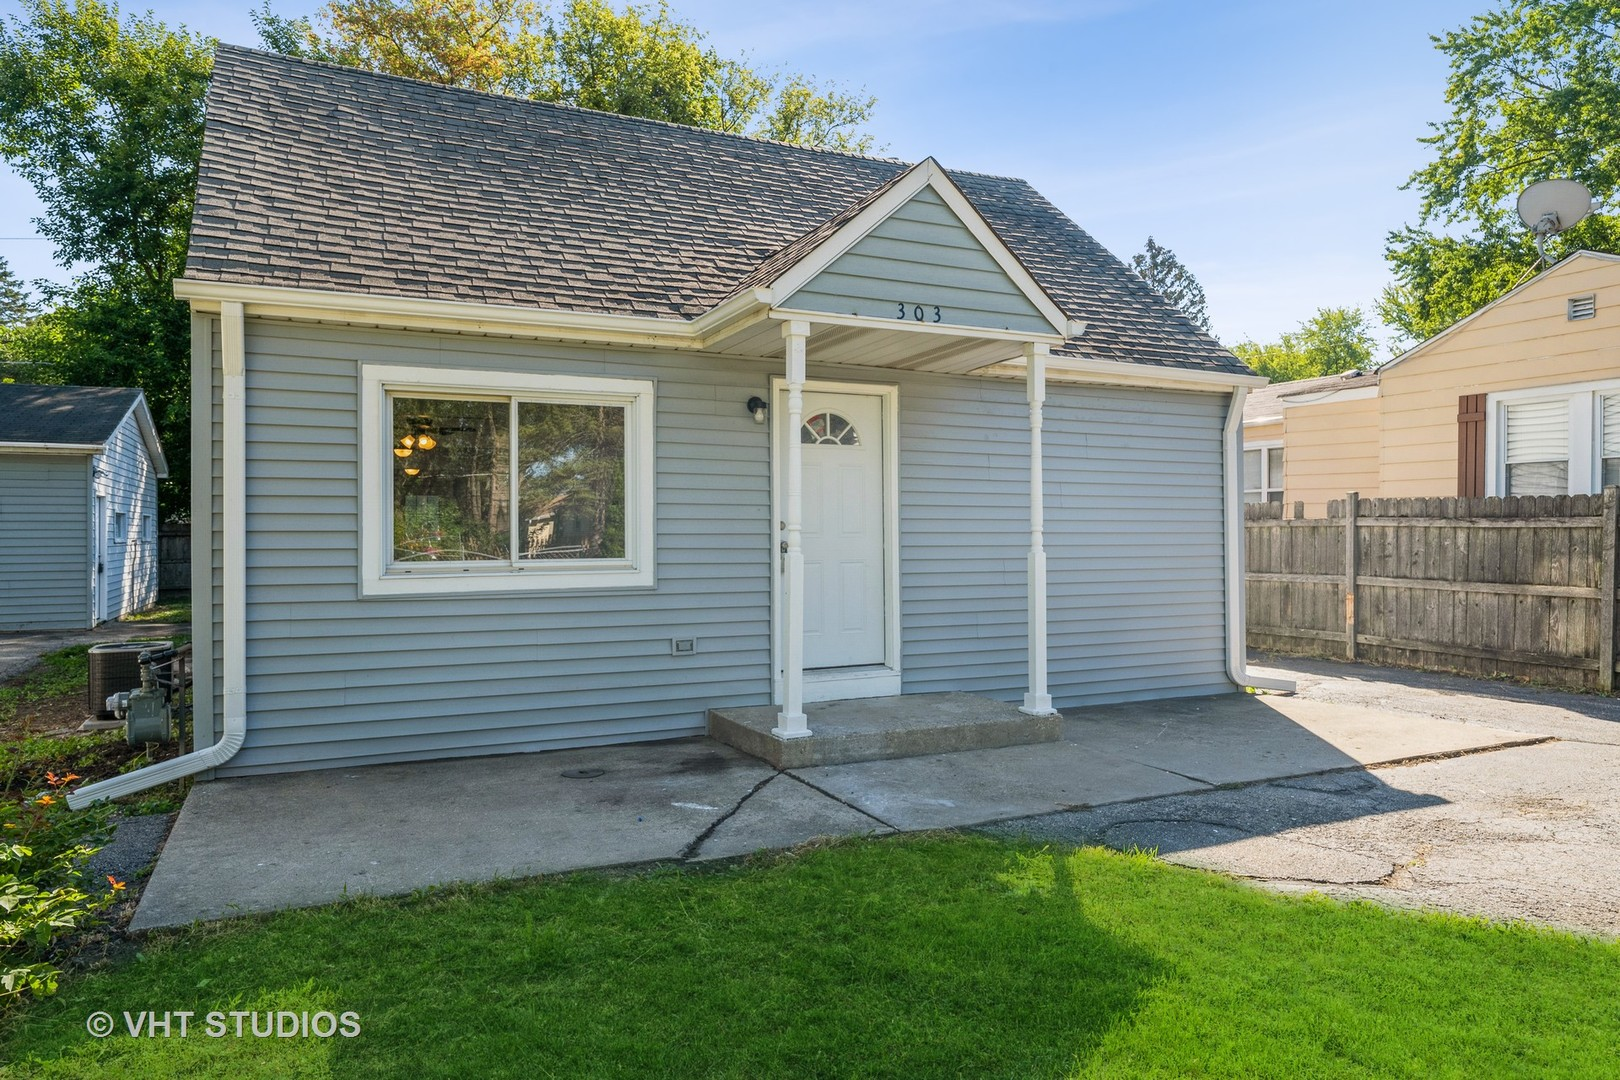 303 Kenwood Drive, Round Lake Park IL 60073